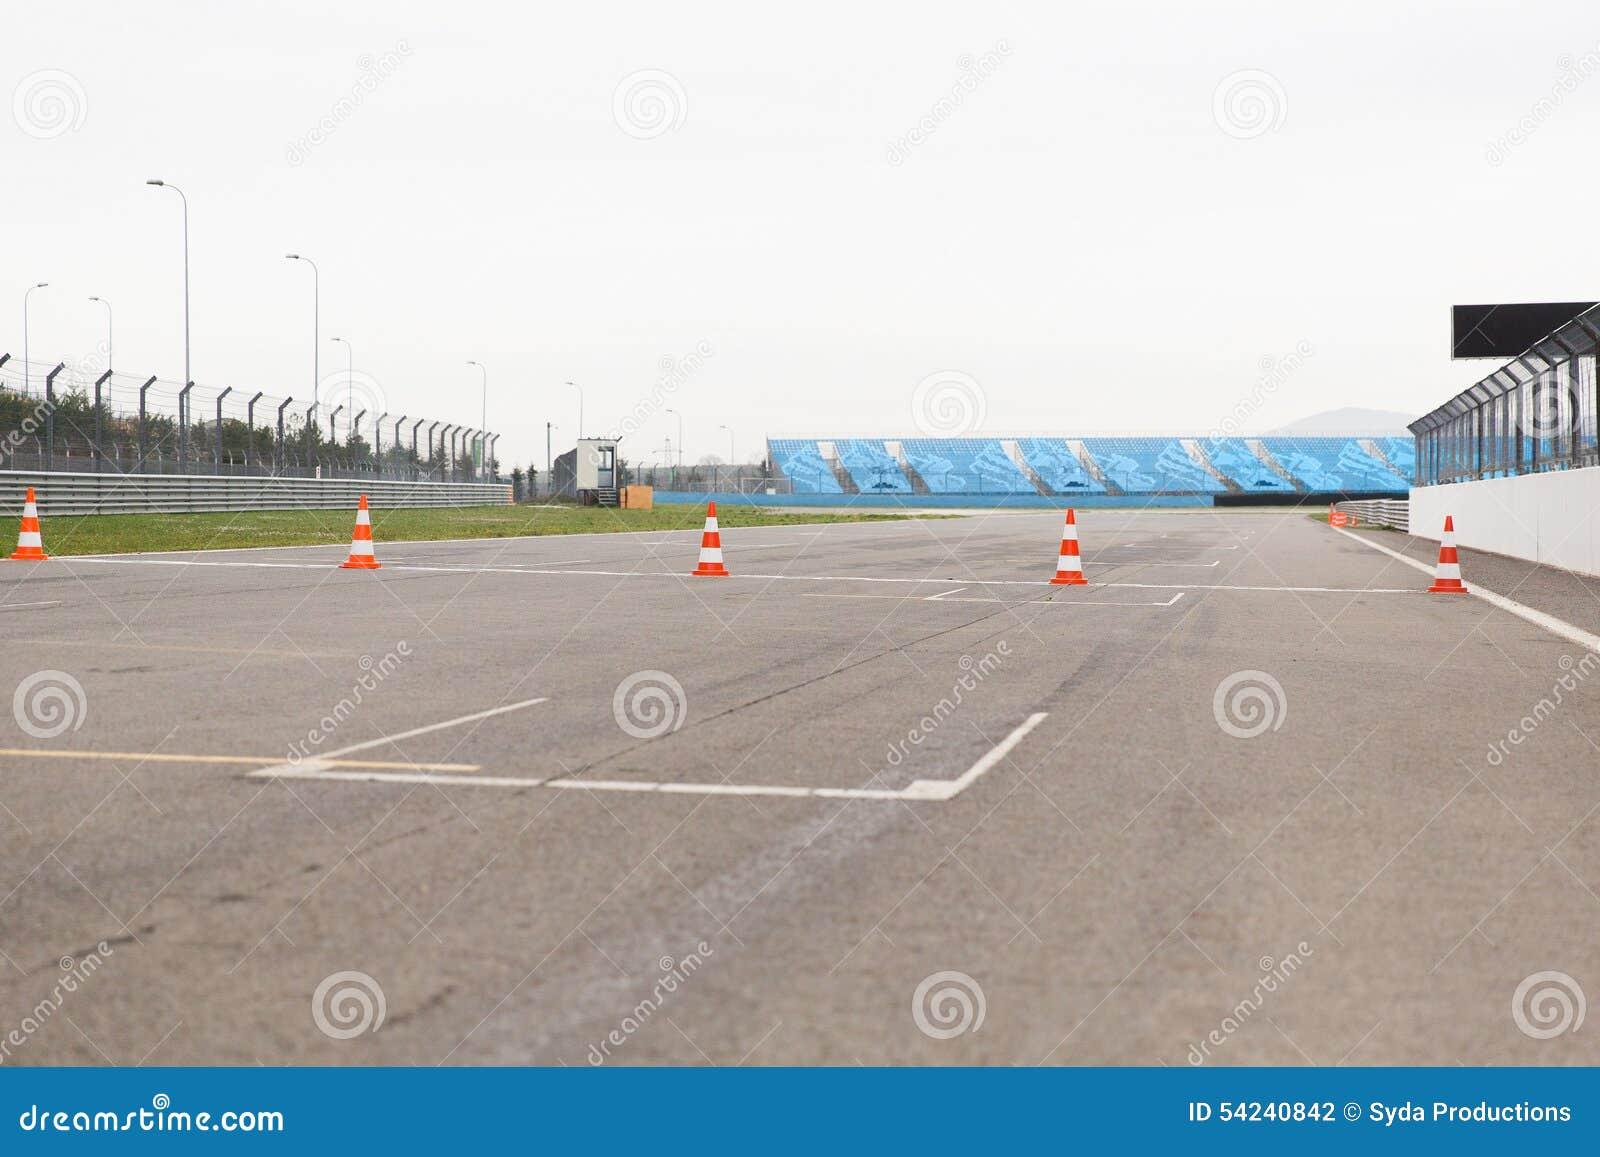 Empty Speedway On Stadium Stock Photo Image 54240842